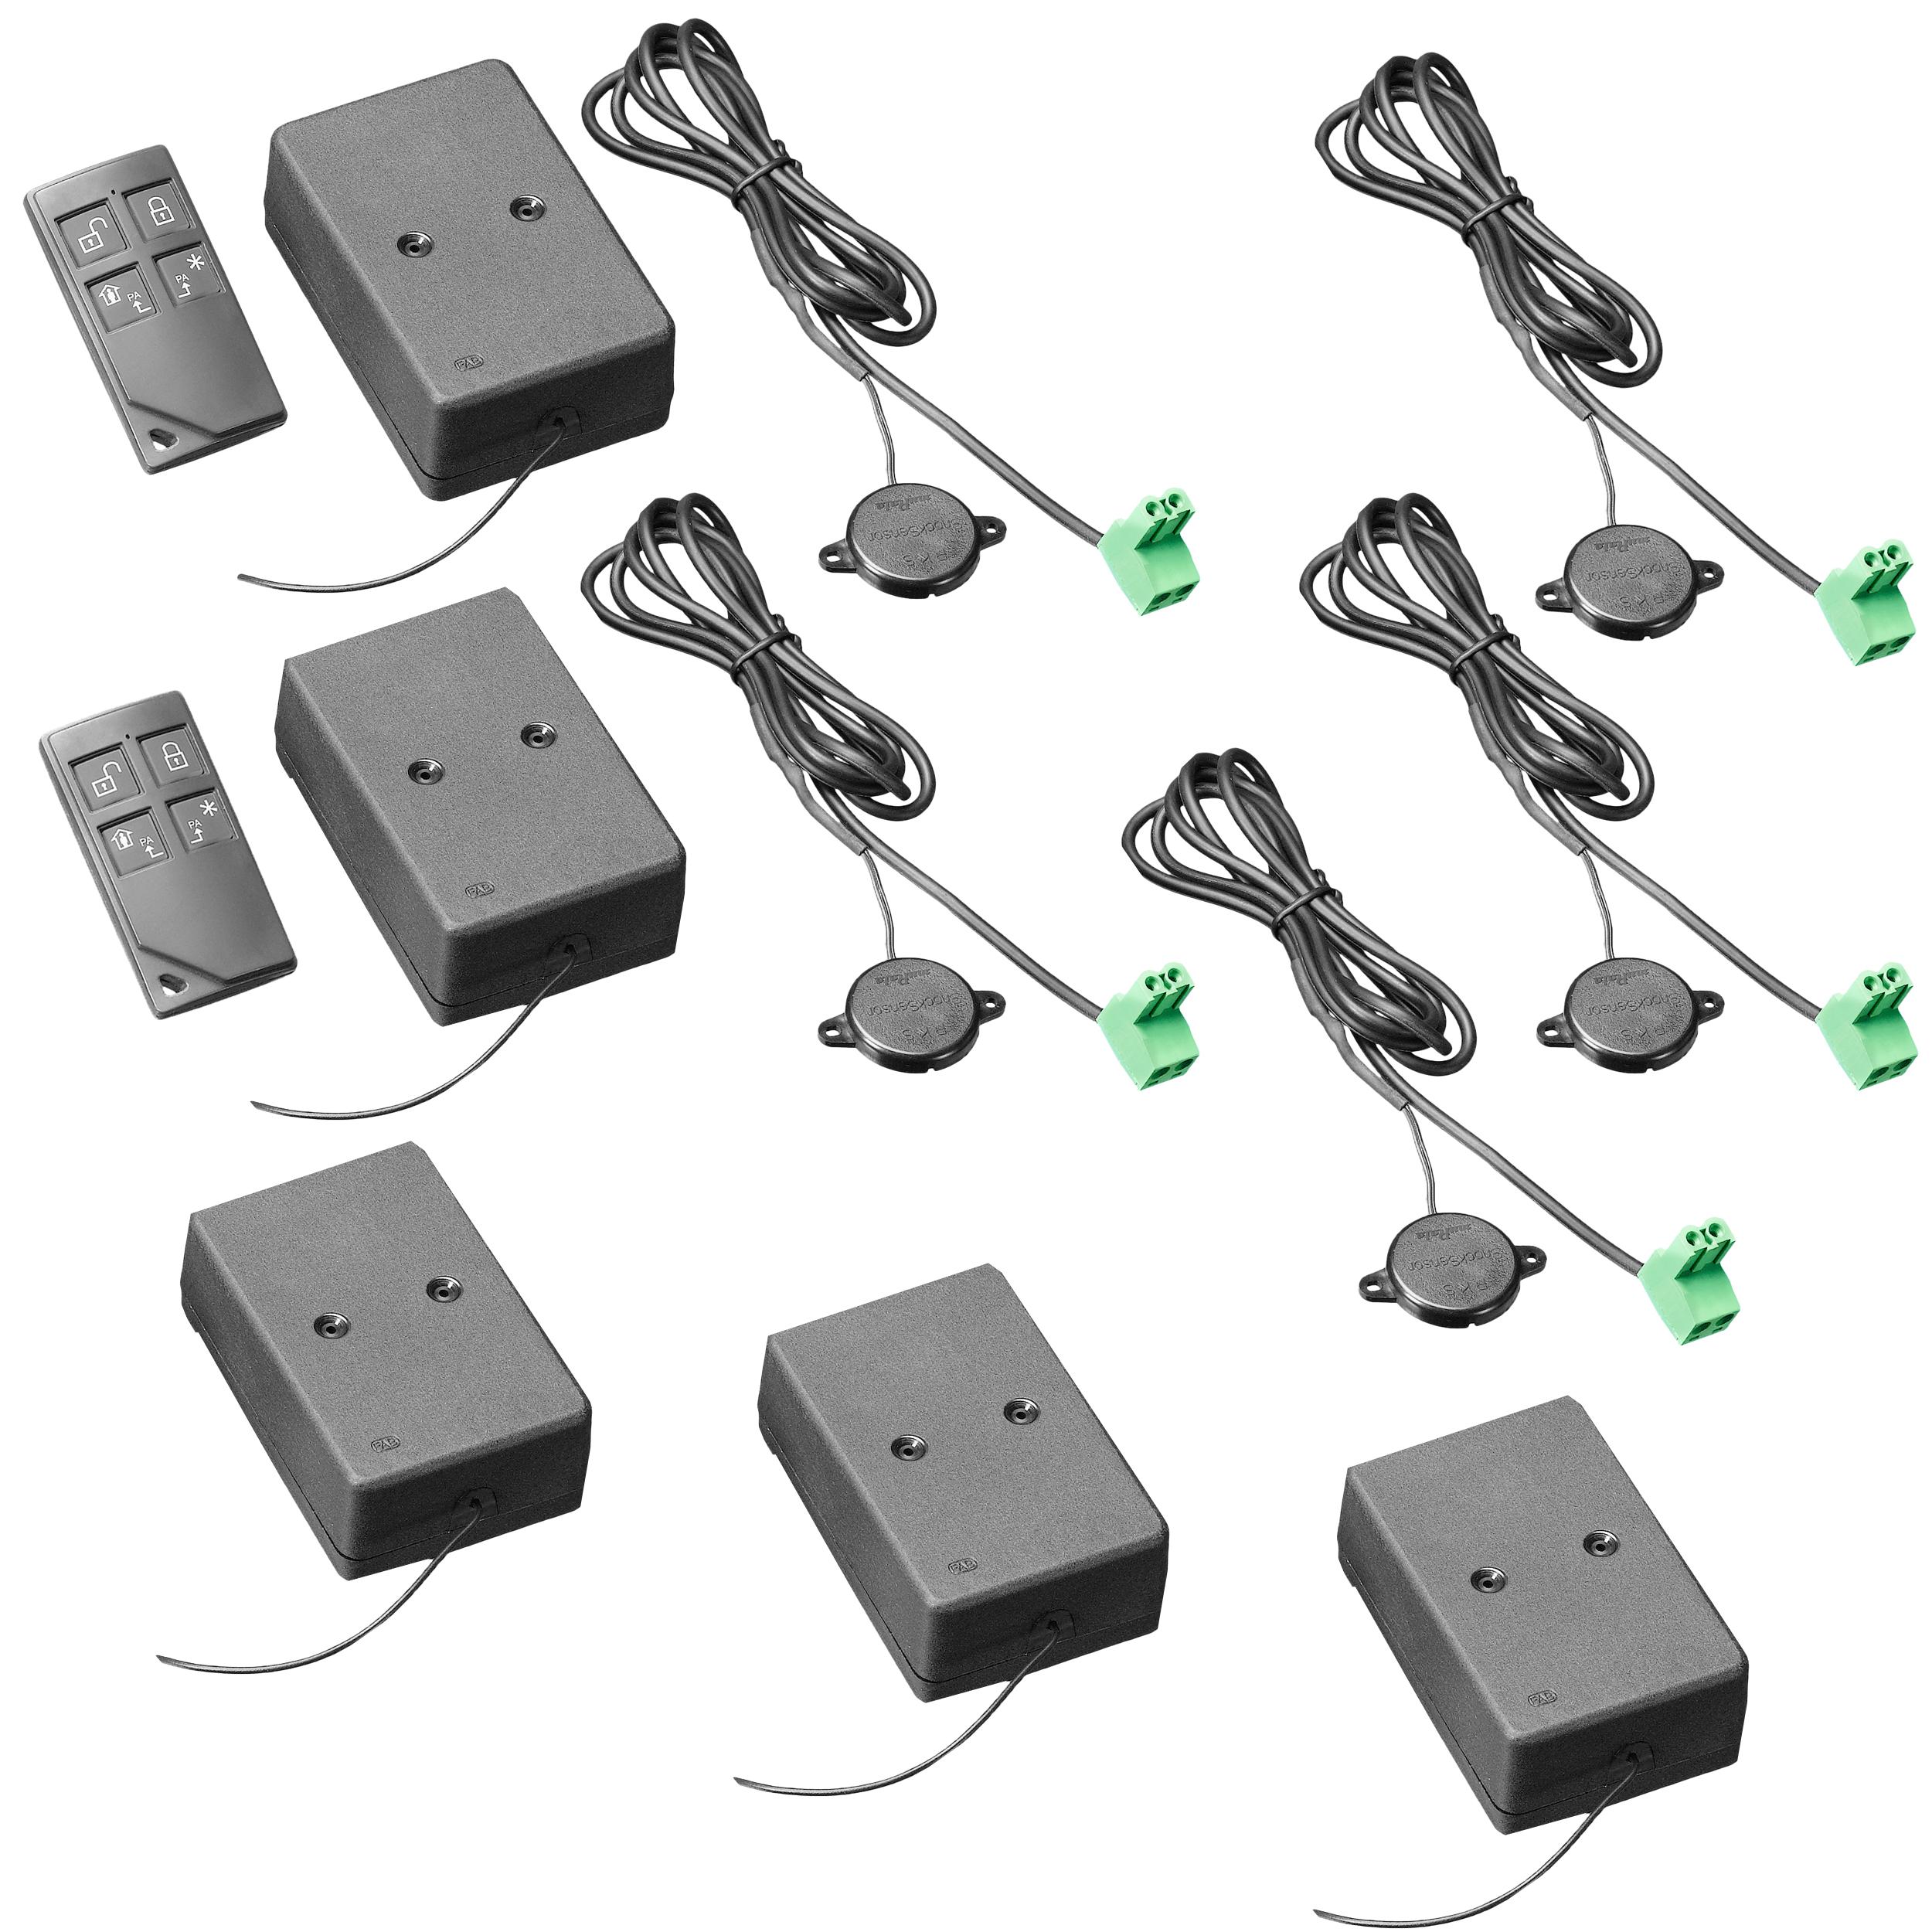 Mobile Wireless Shooting Range Starter Kit